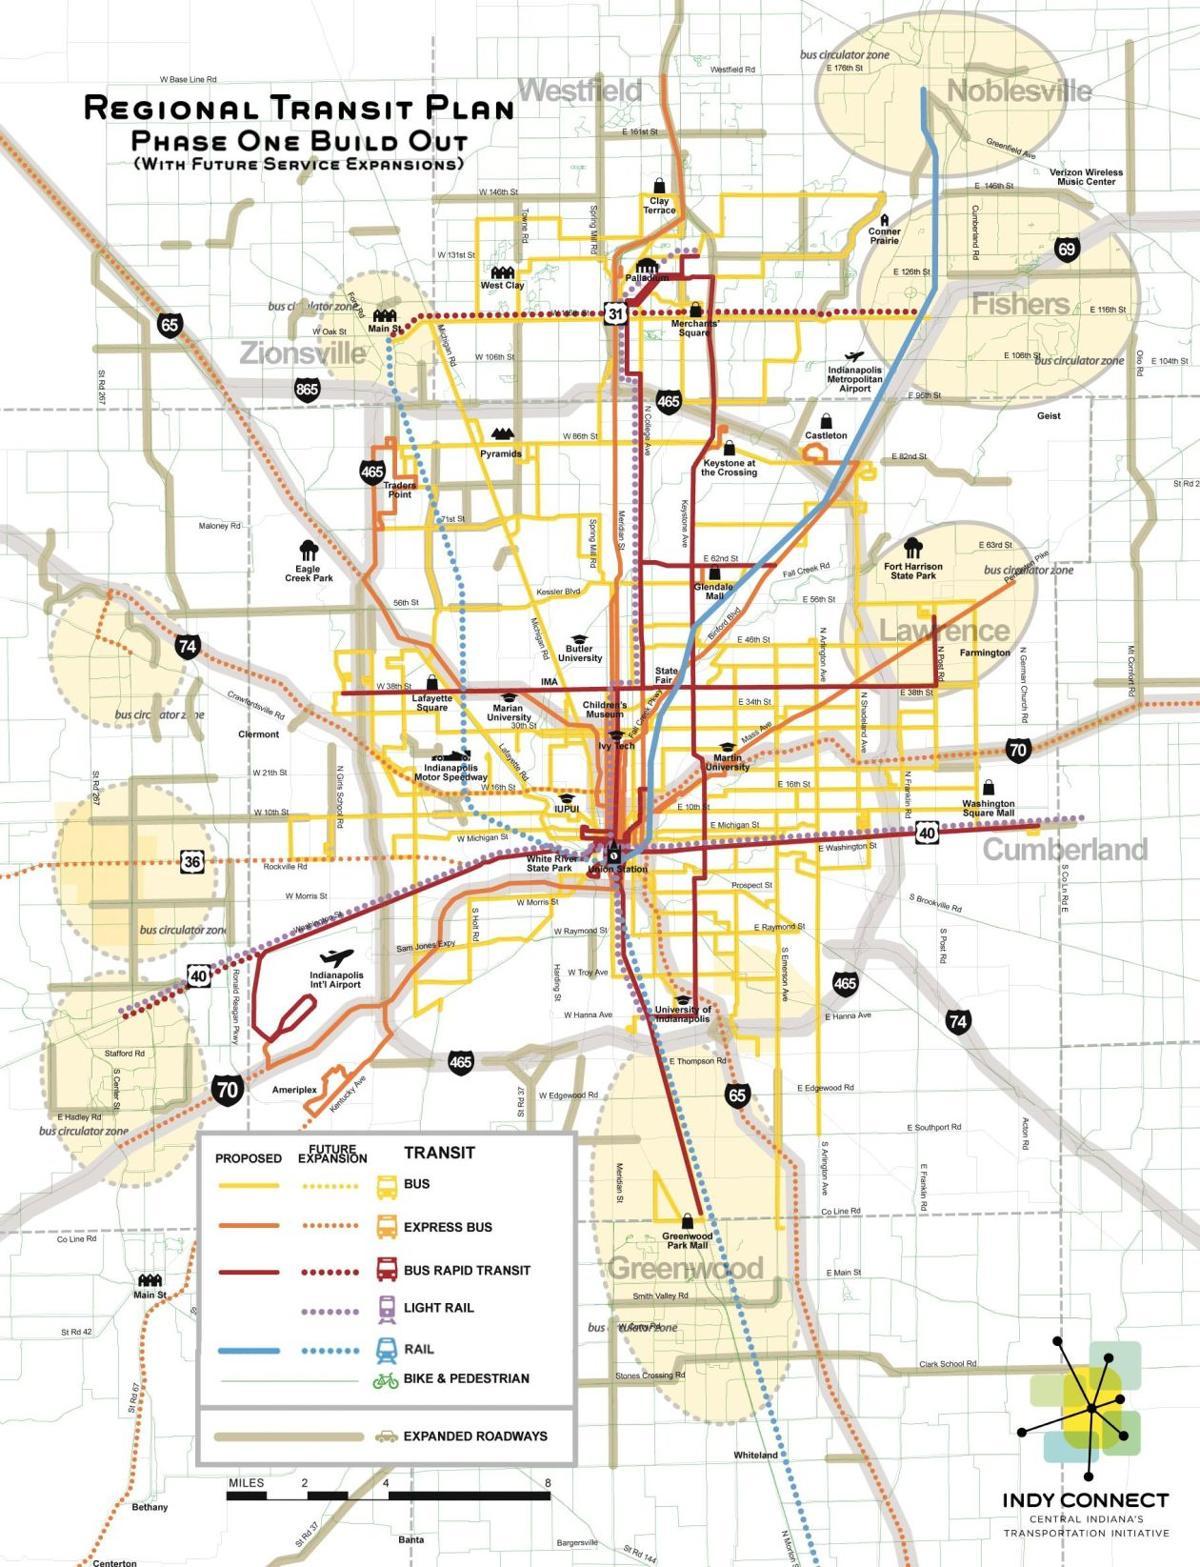 Business boosters push transit plan